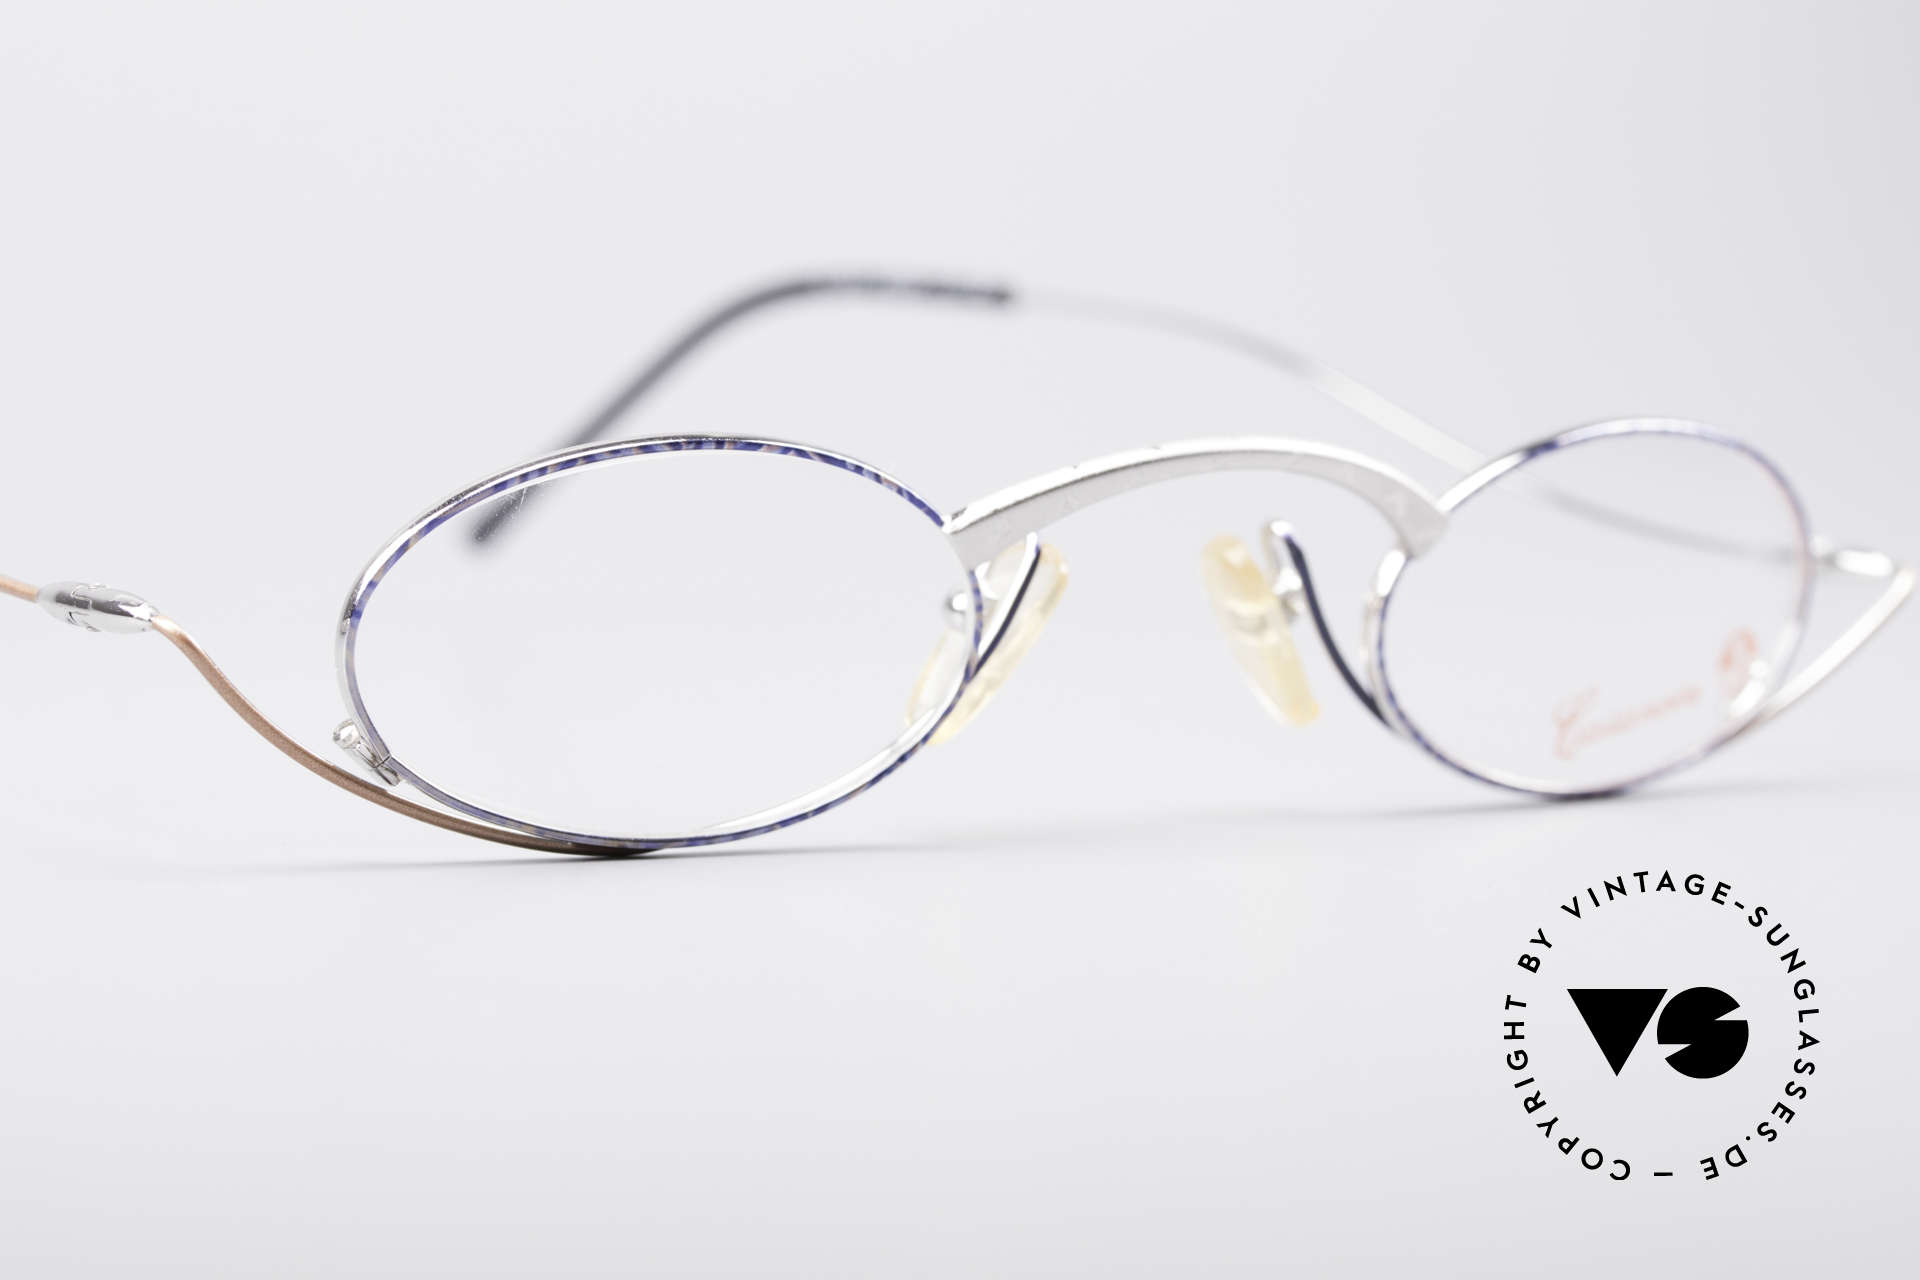 Casanova LC44 Artistic Reading Glasses, unworn (like all our rare vintage reading eyeglasses), Made for Men and Women